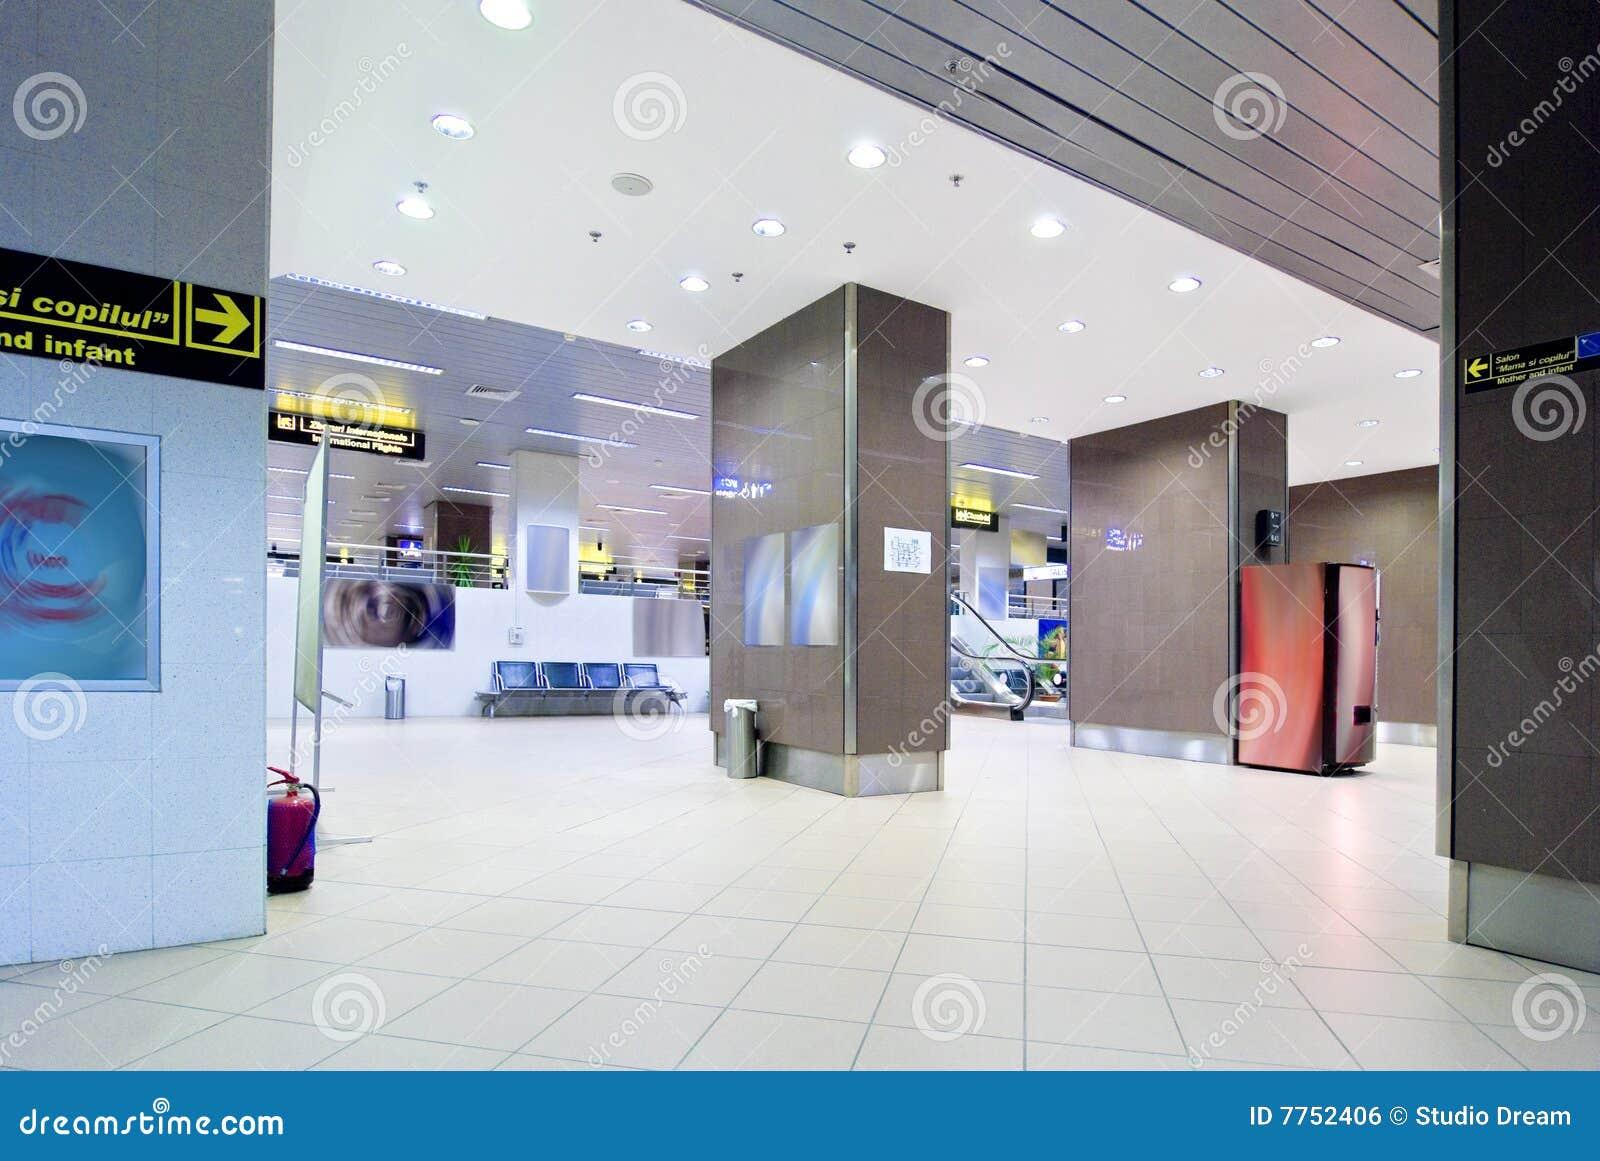 Lotniskowa sala